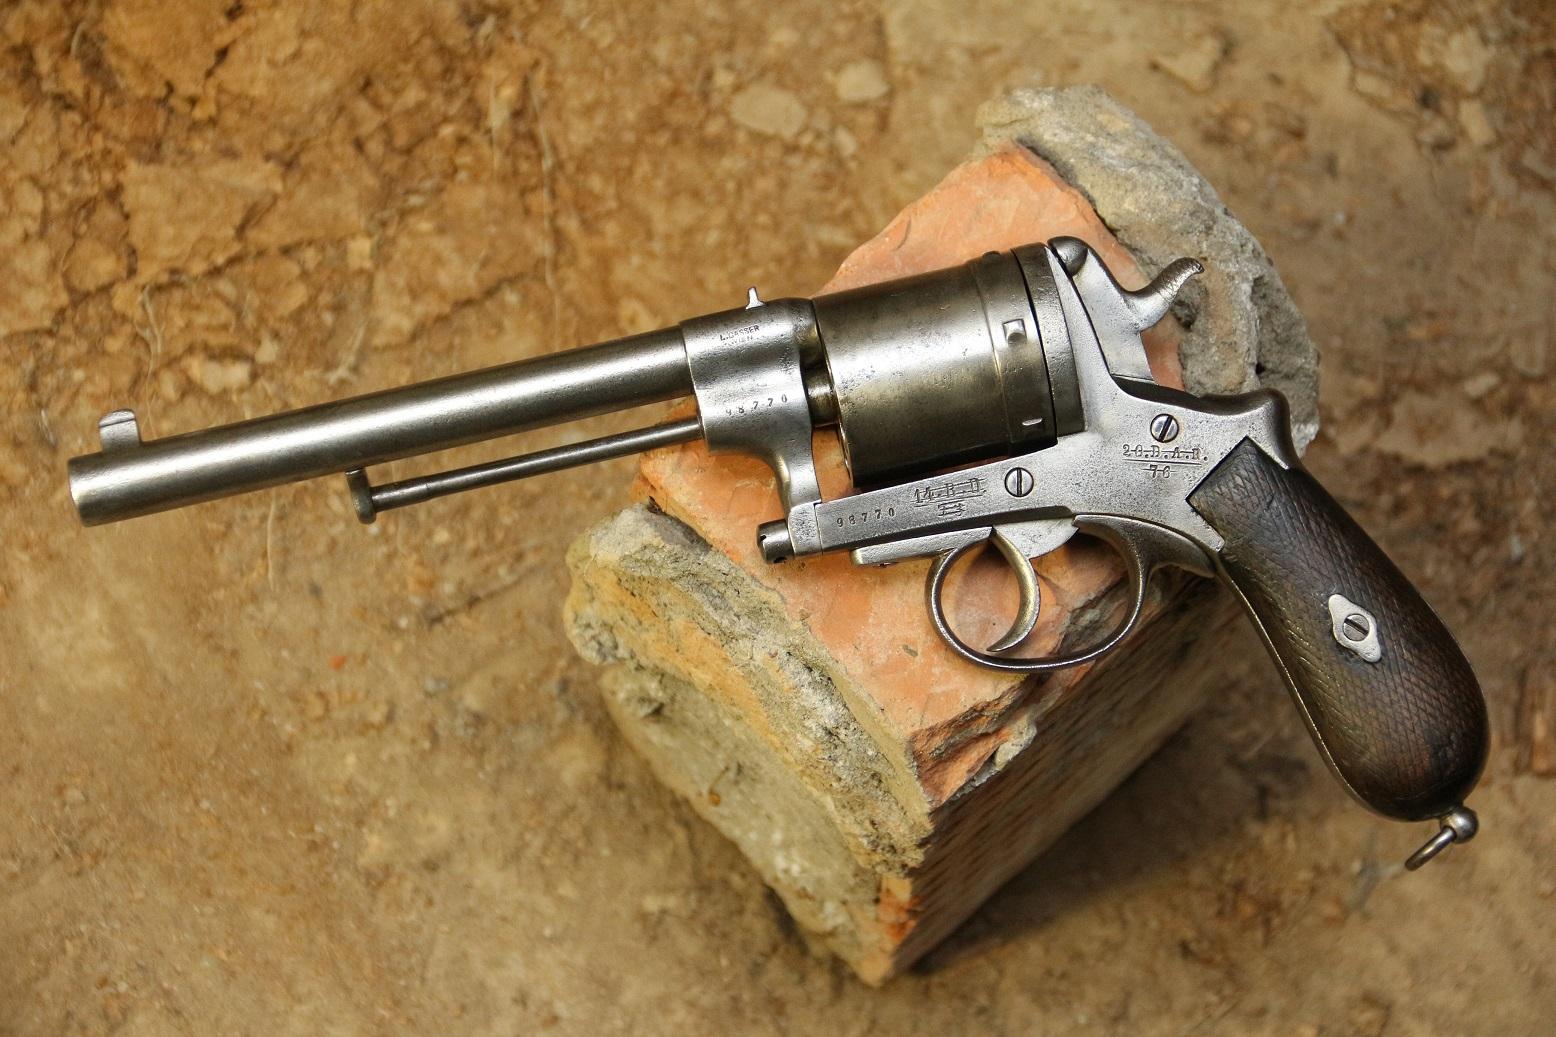 Фото Армейский револьвер Gasser m1870 #98770, с историей